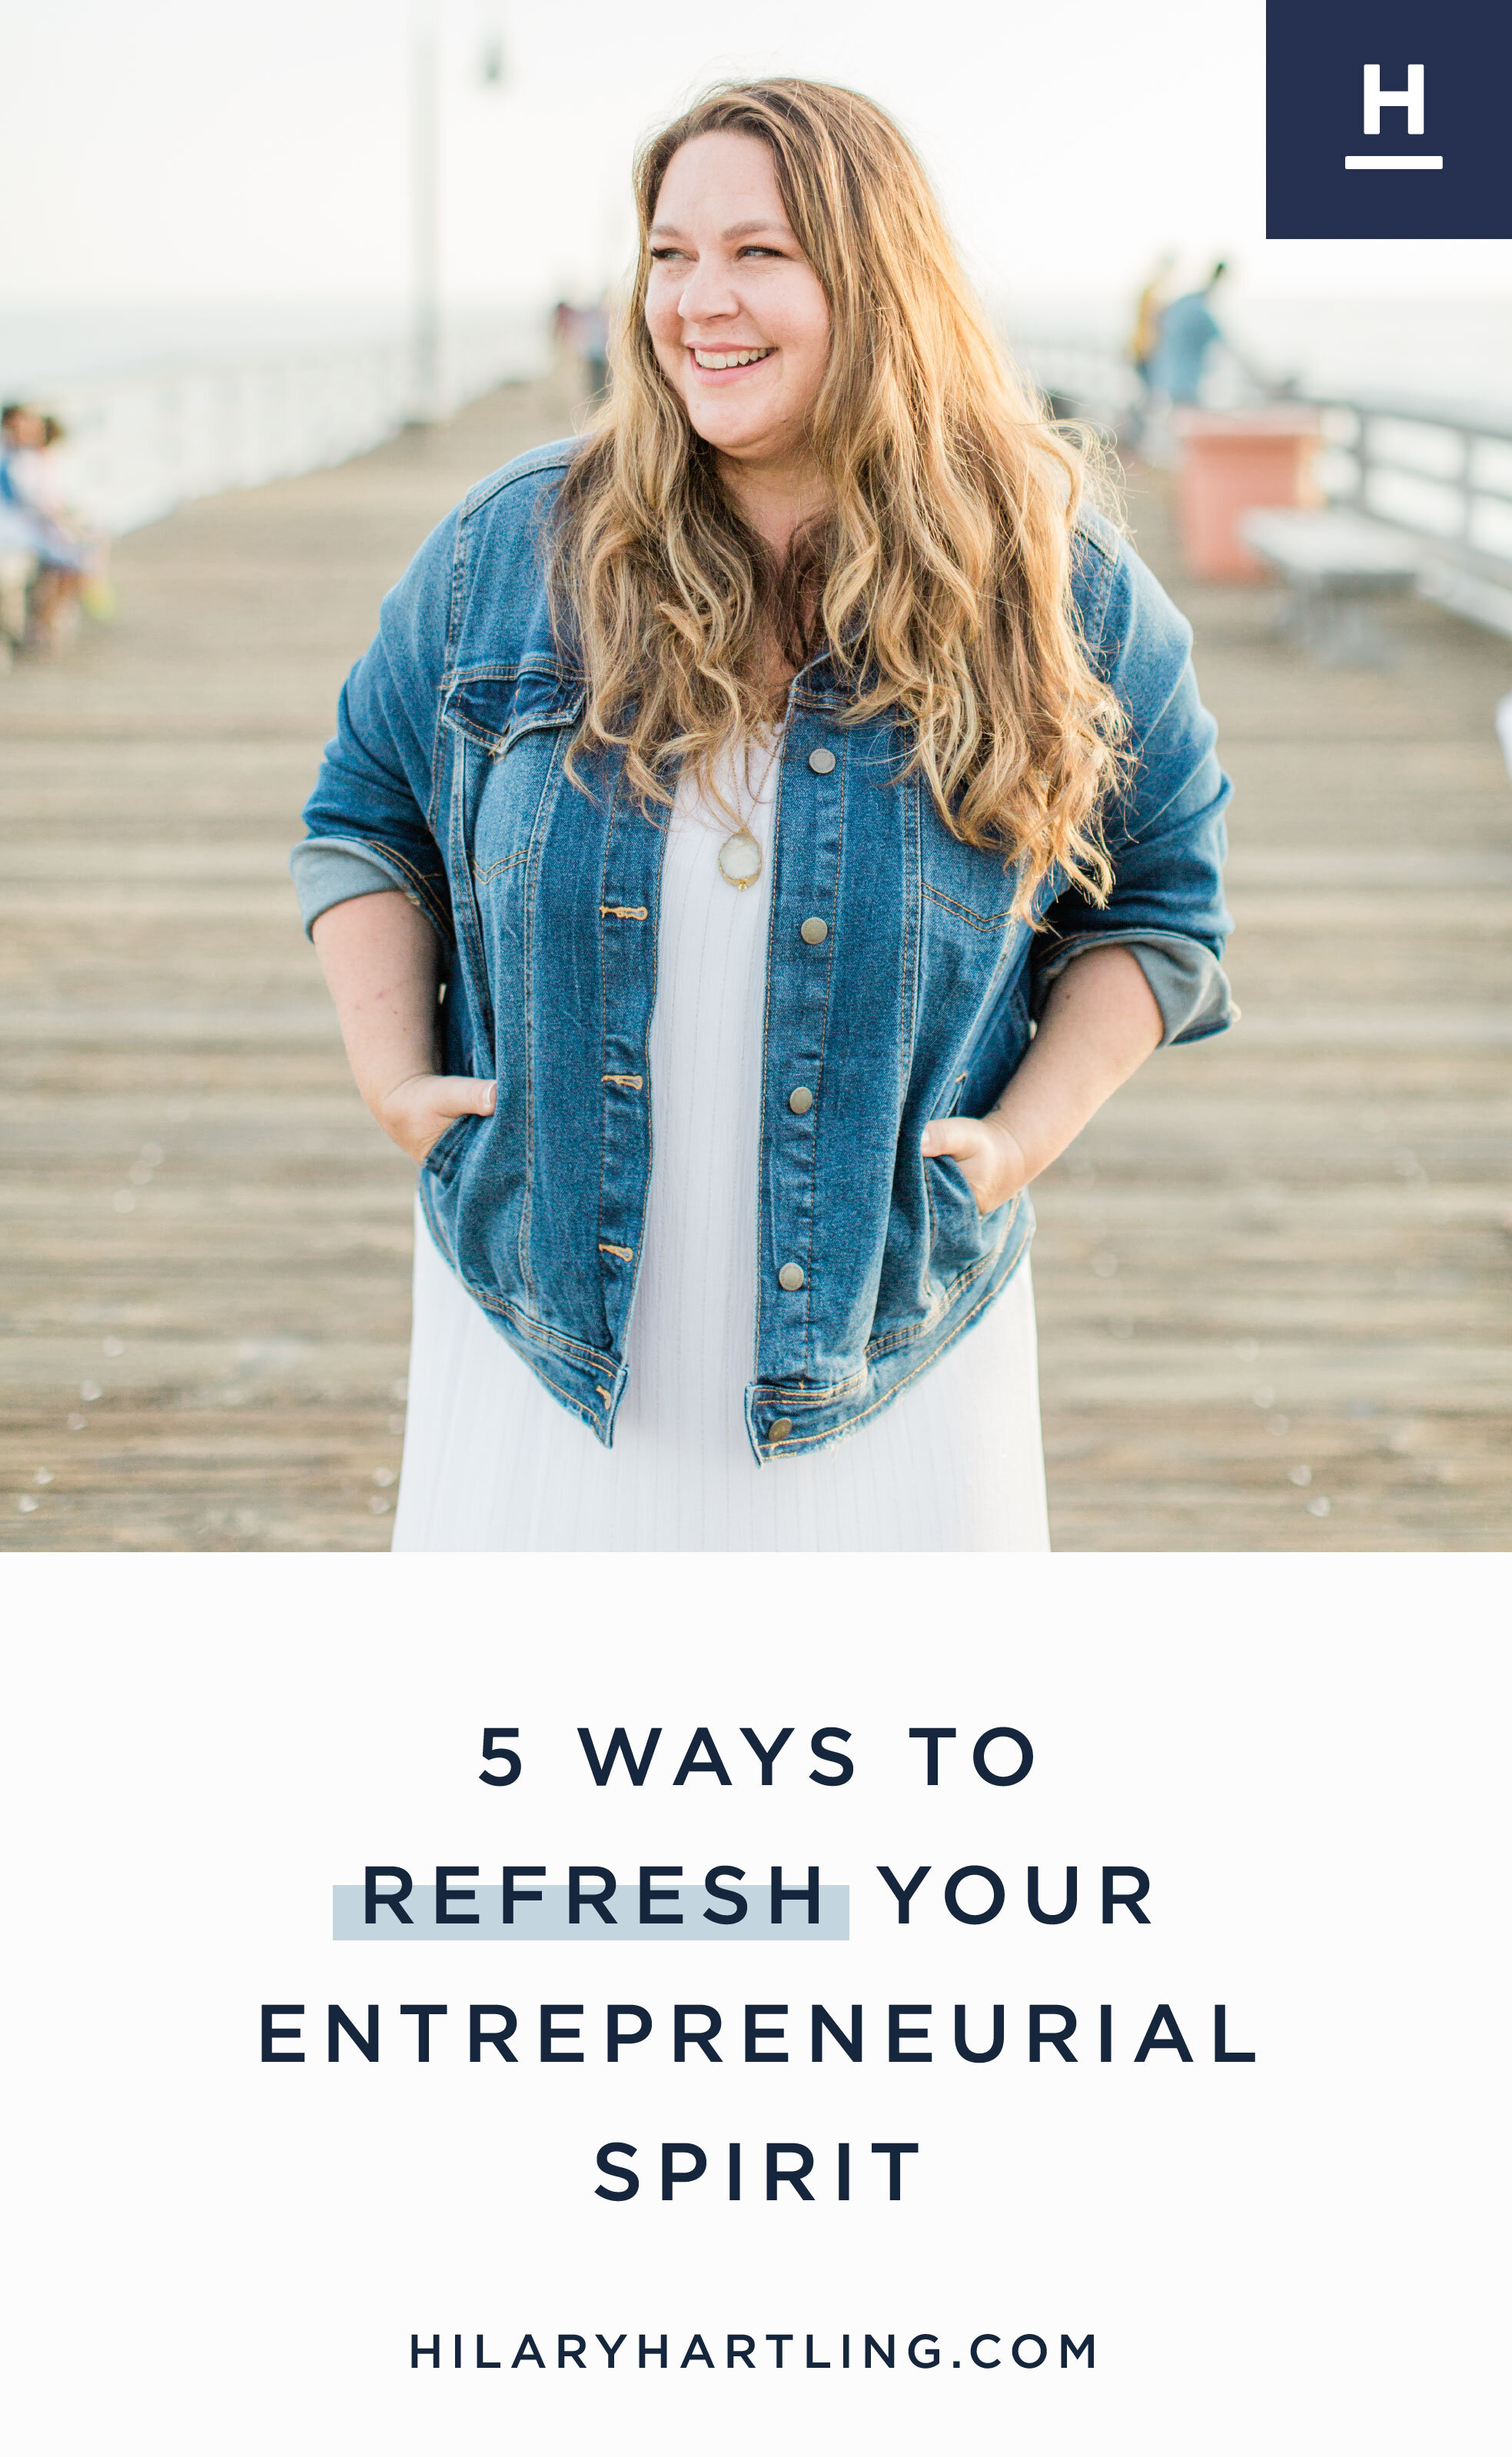 5-Ways-To-Refresh-Your-Entrepreneurial-Spirit.jpg